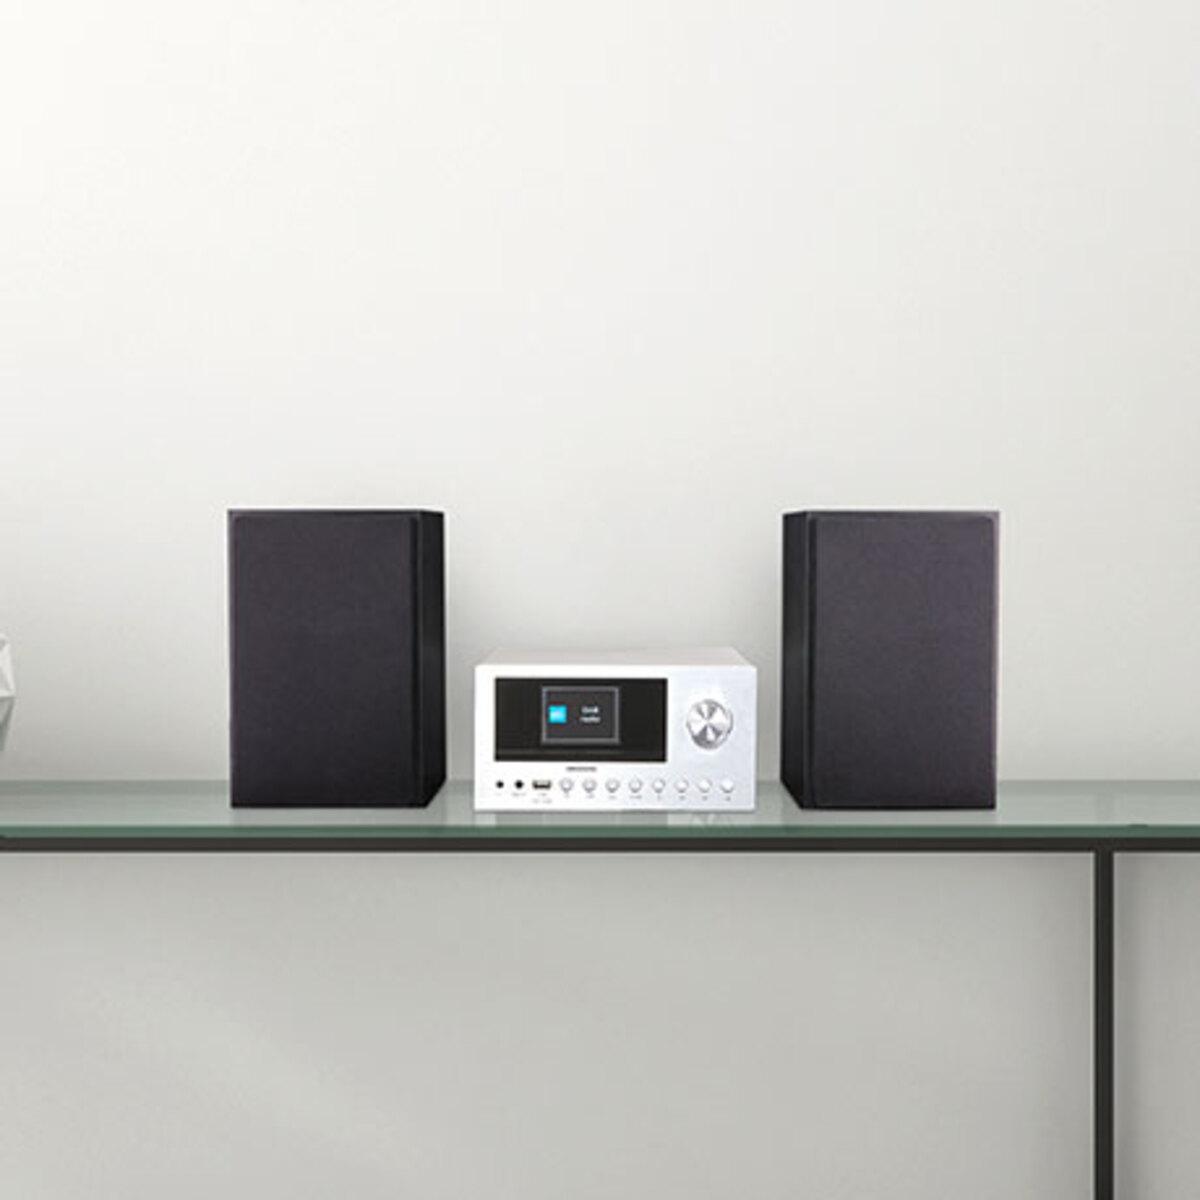 Bild 1 von P85003 Internet/DAB+ Mikro Audio System